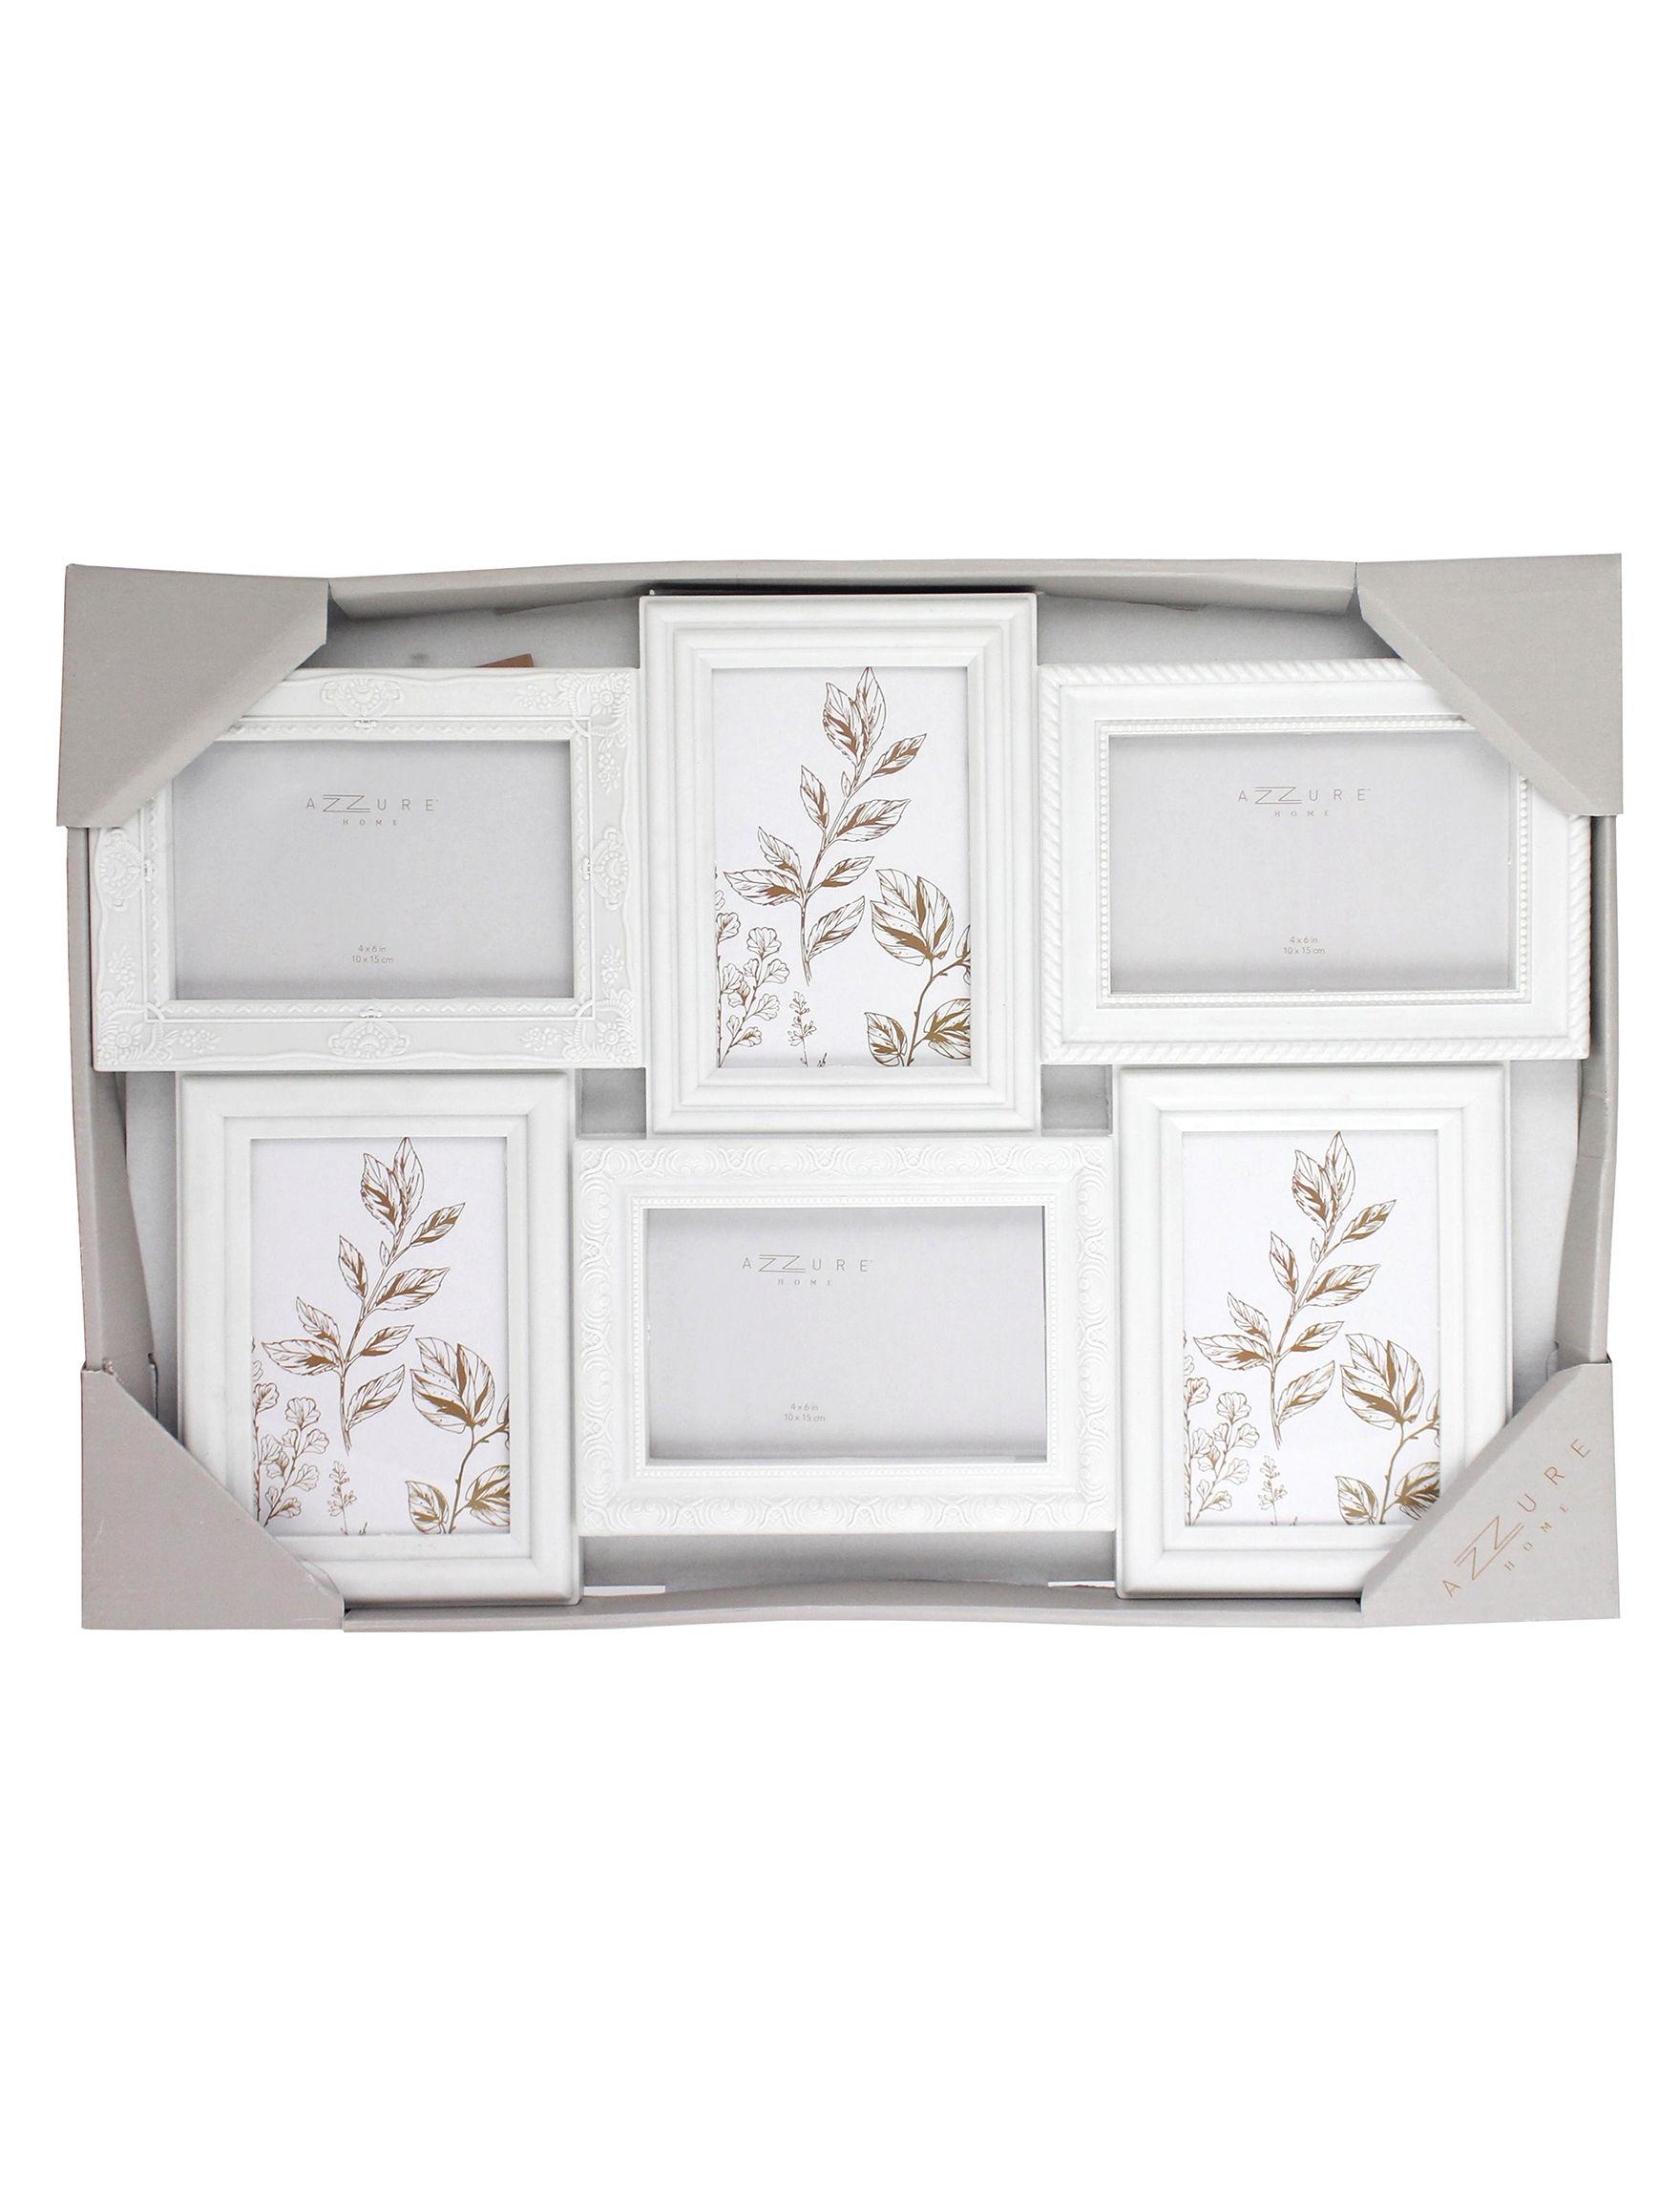 Azzure Home White Frames & Shadow Boxes